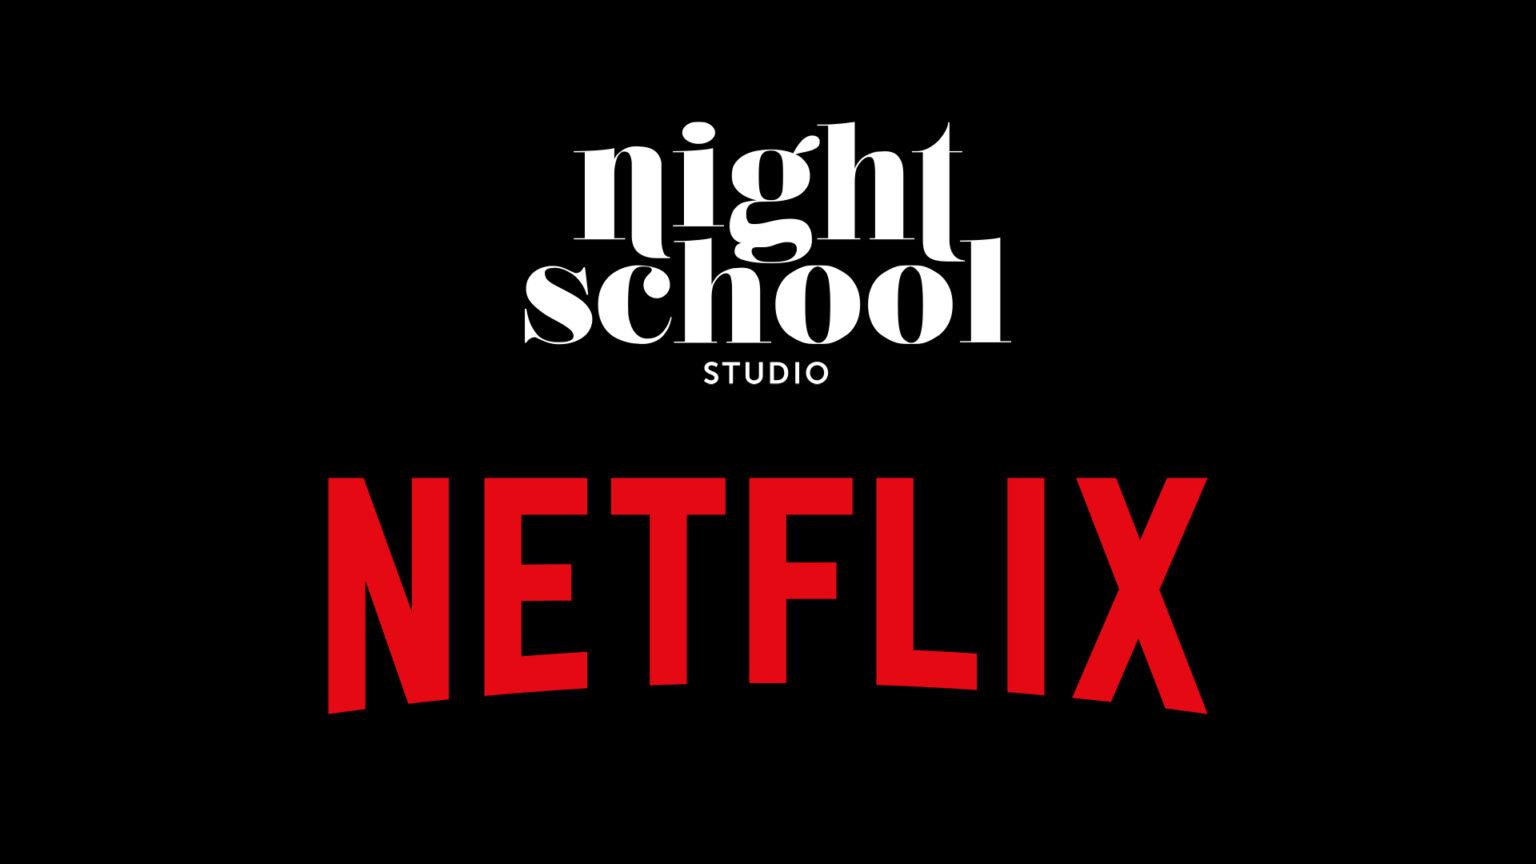 Netflix: Streaming provider takes over first developer studio